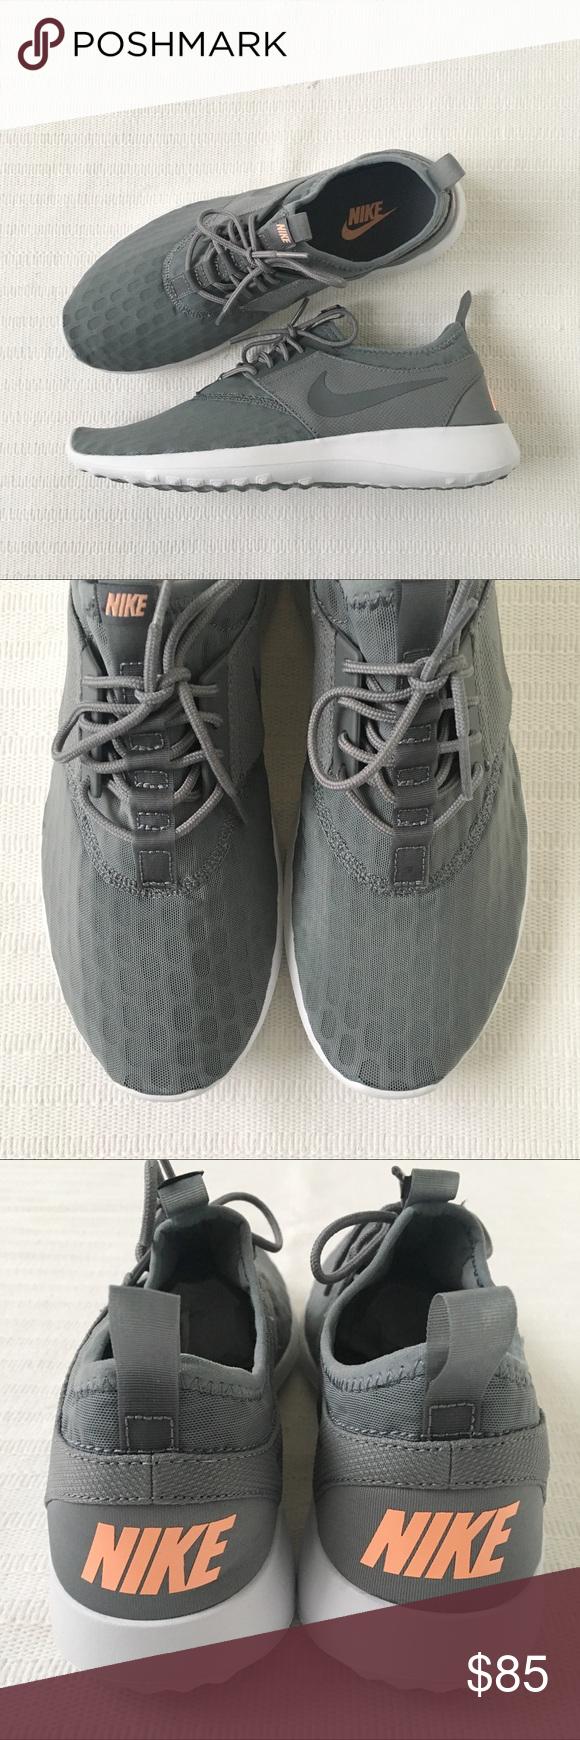 Women's Nike Juvenate Low Running Sneakers NWT